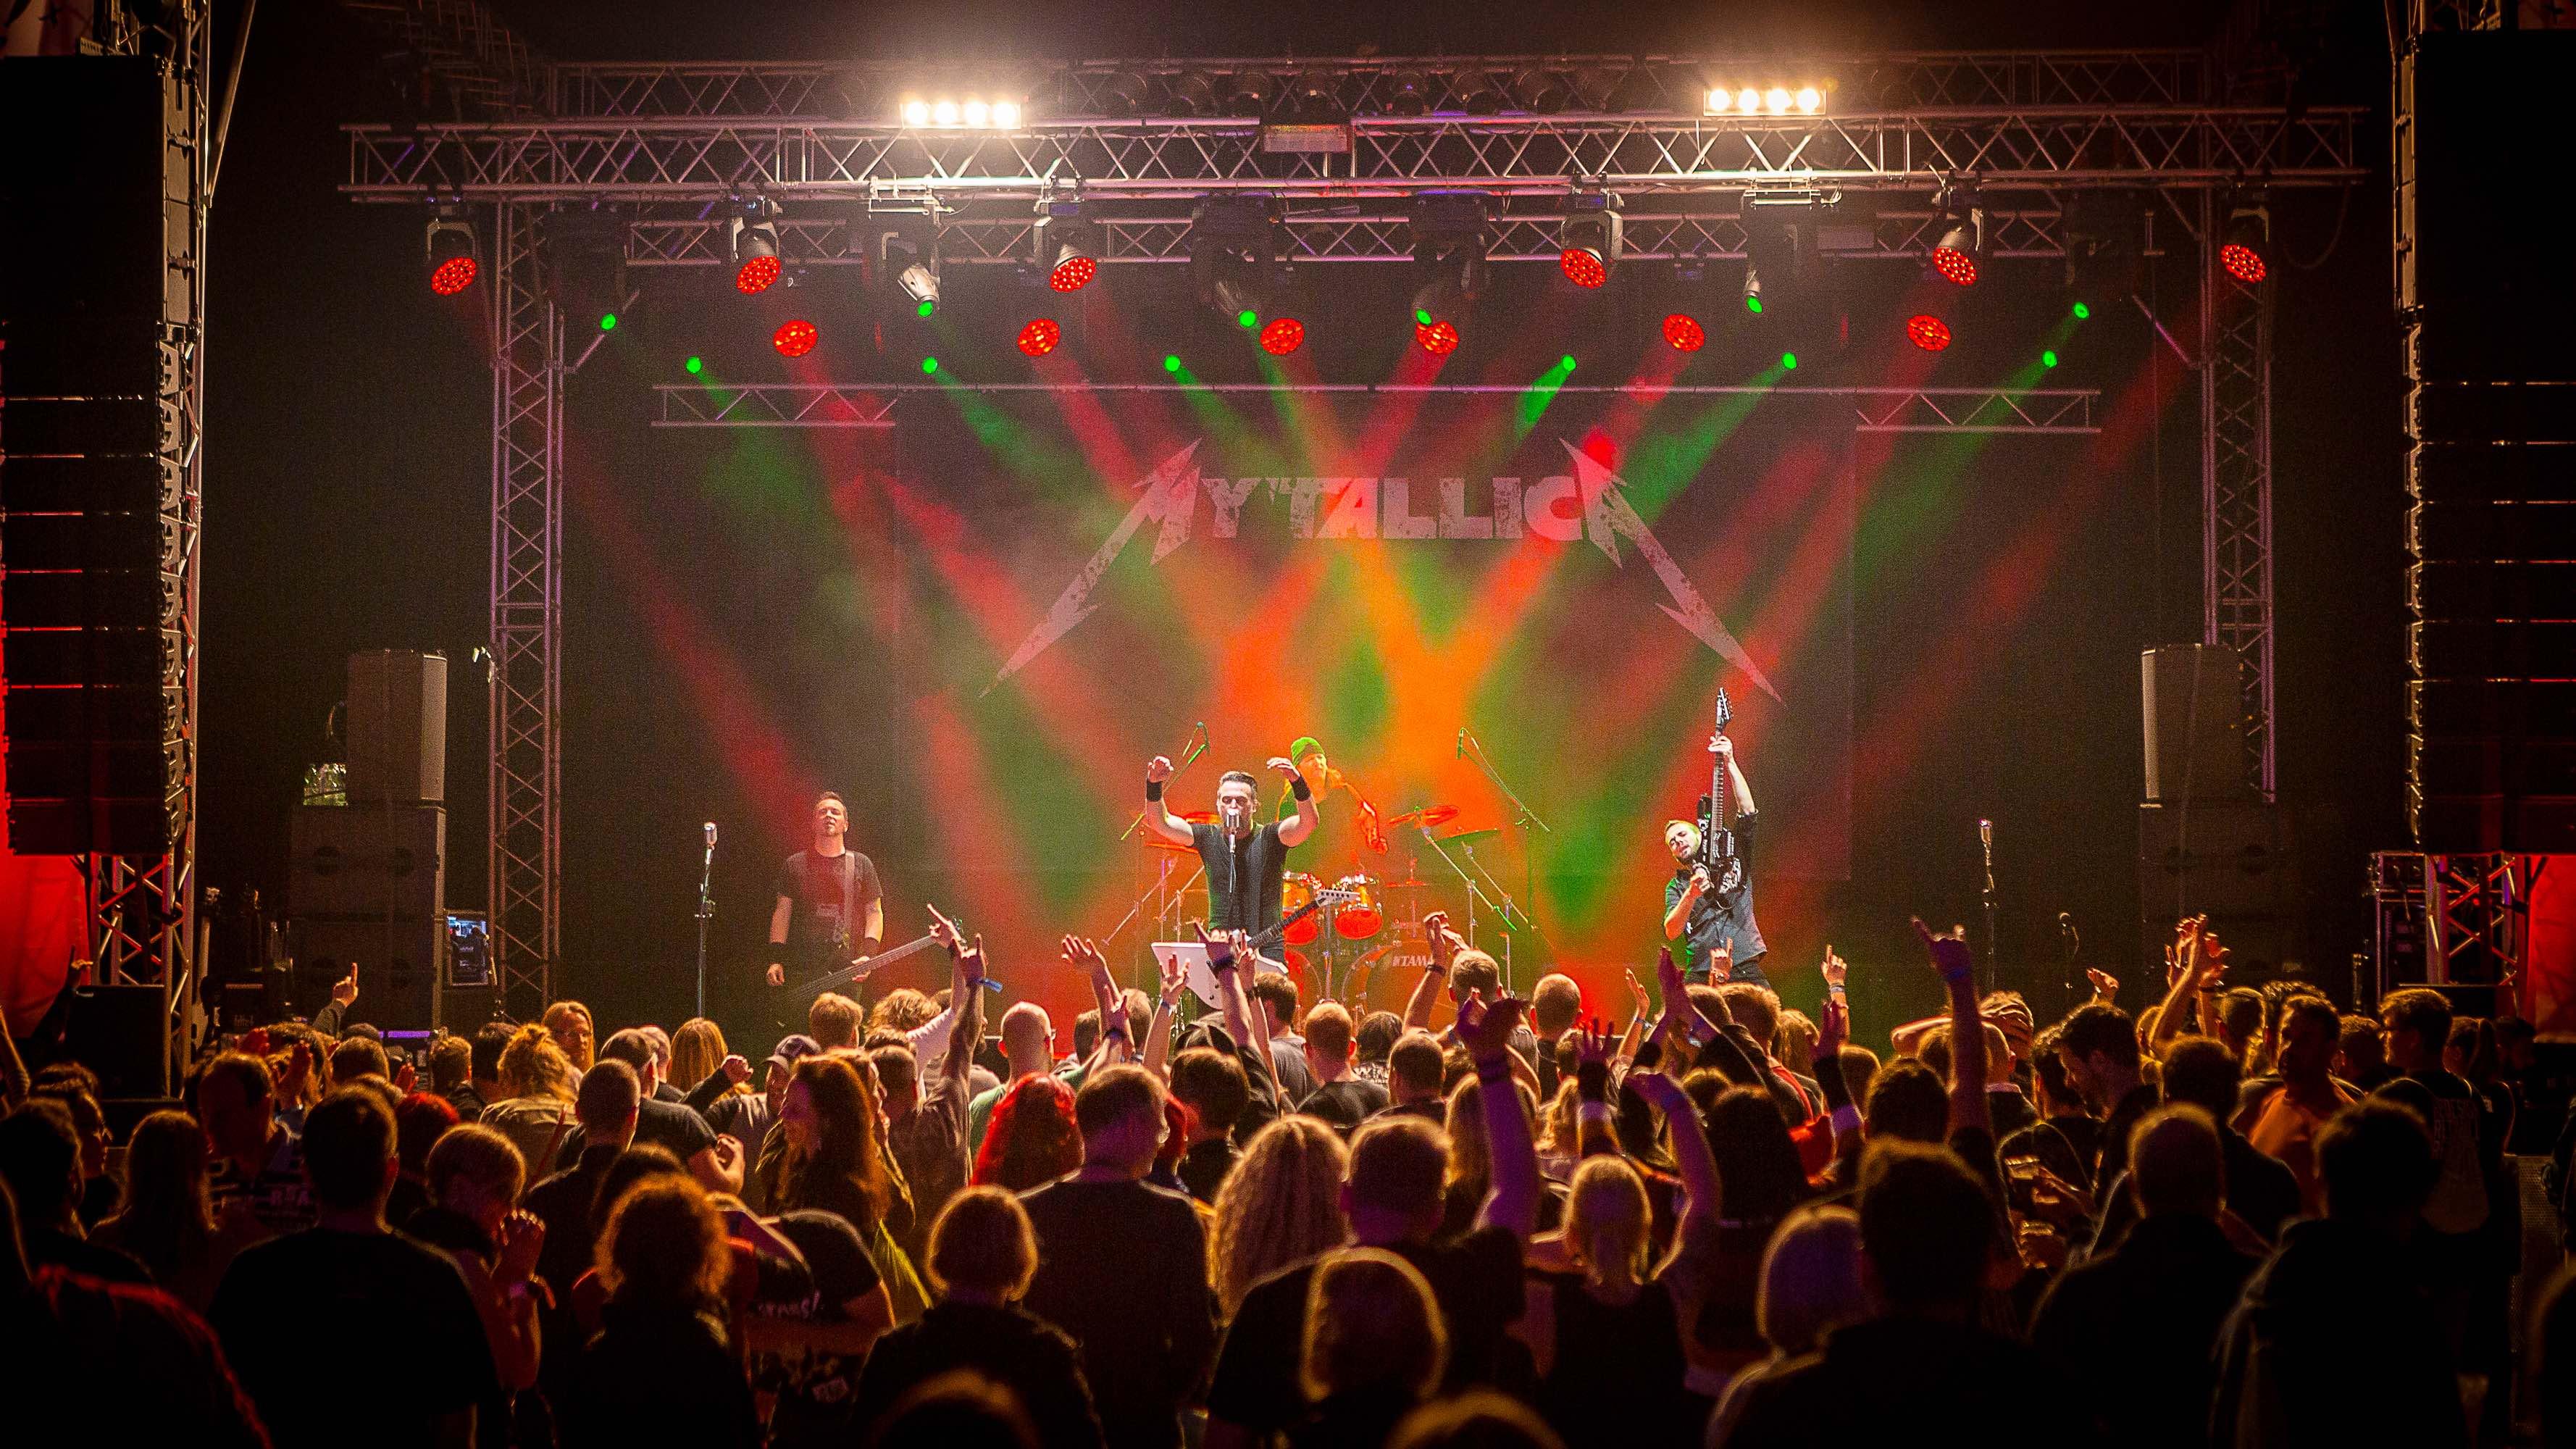 Metallica-Coverband-MYTALLICA-Tribute-Band-Warendorf-iFan-Musikfestival-2017-Tilo-Klein_68A6694-Slider-1